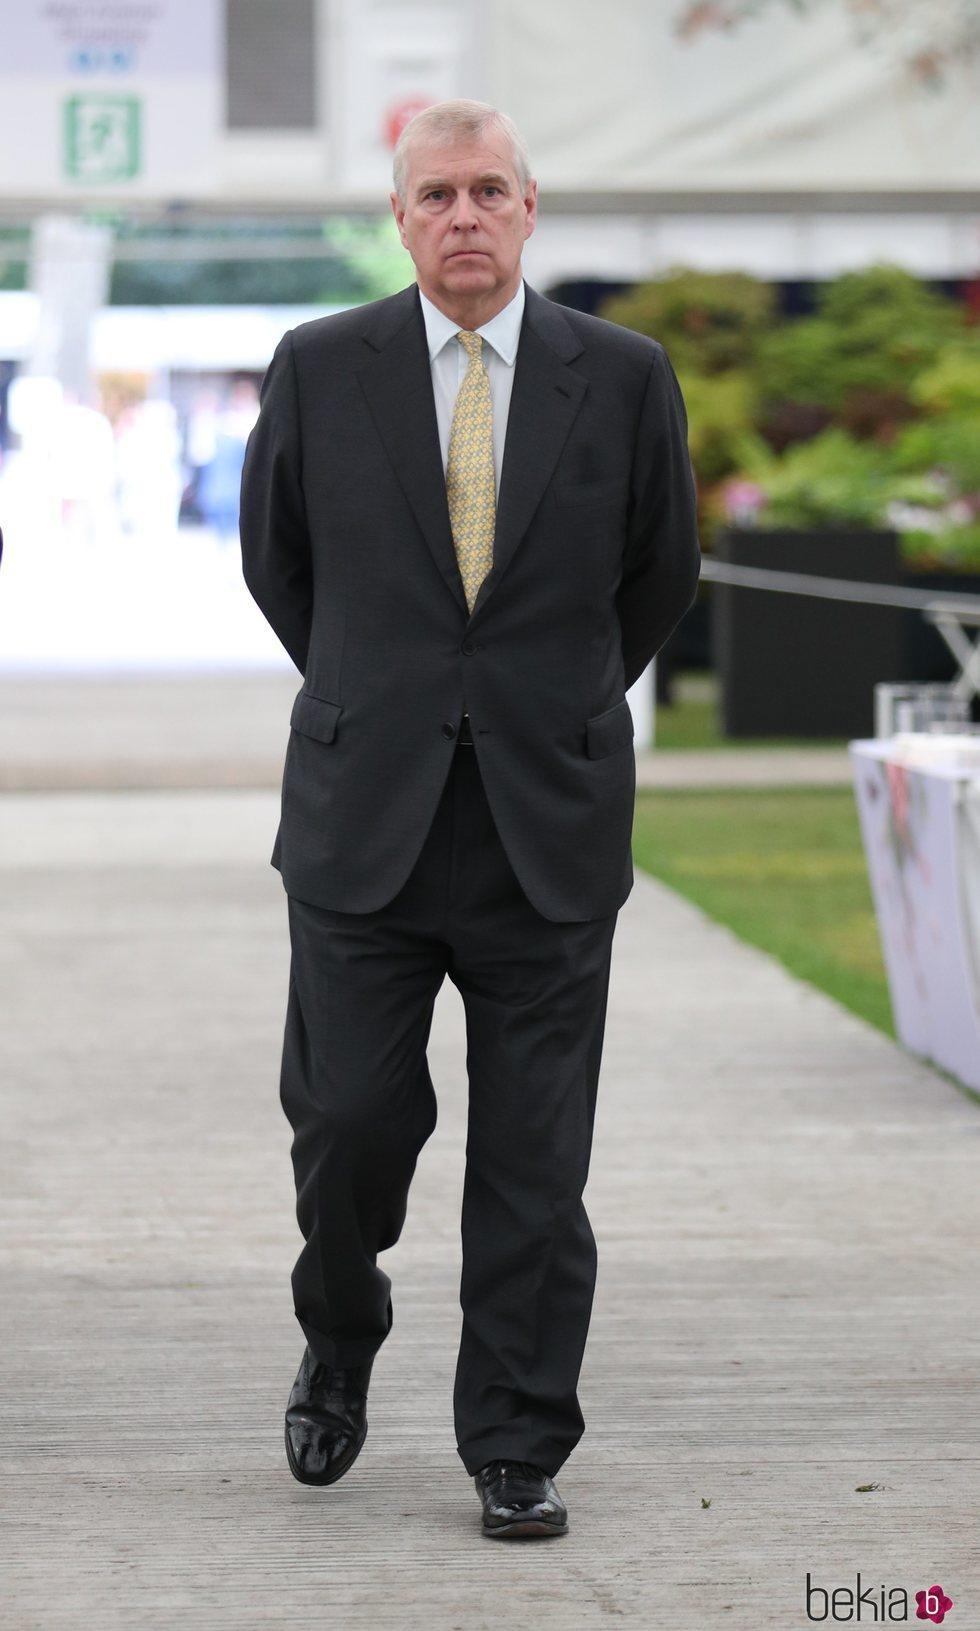 El Príncipe Andrés en Chelsea Flower Show 2019